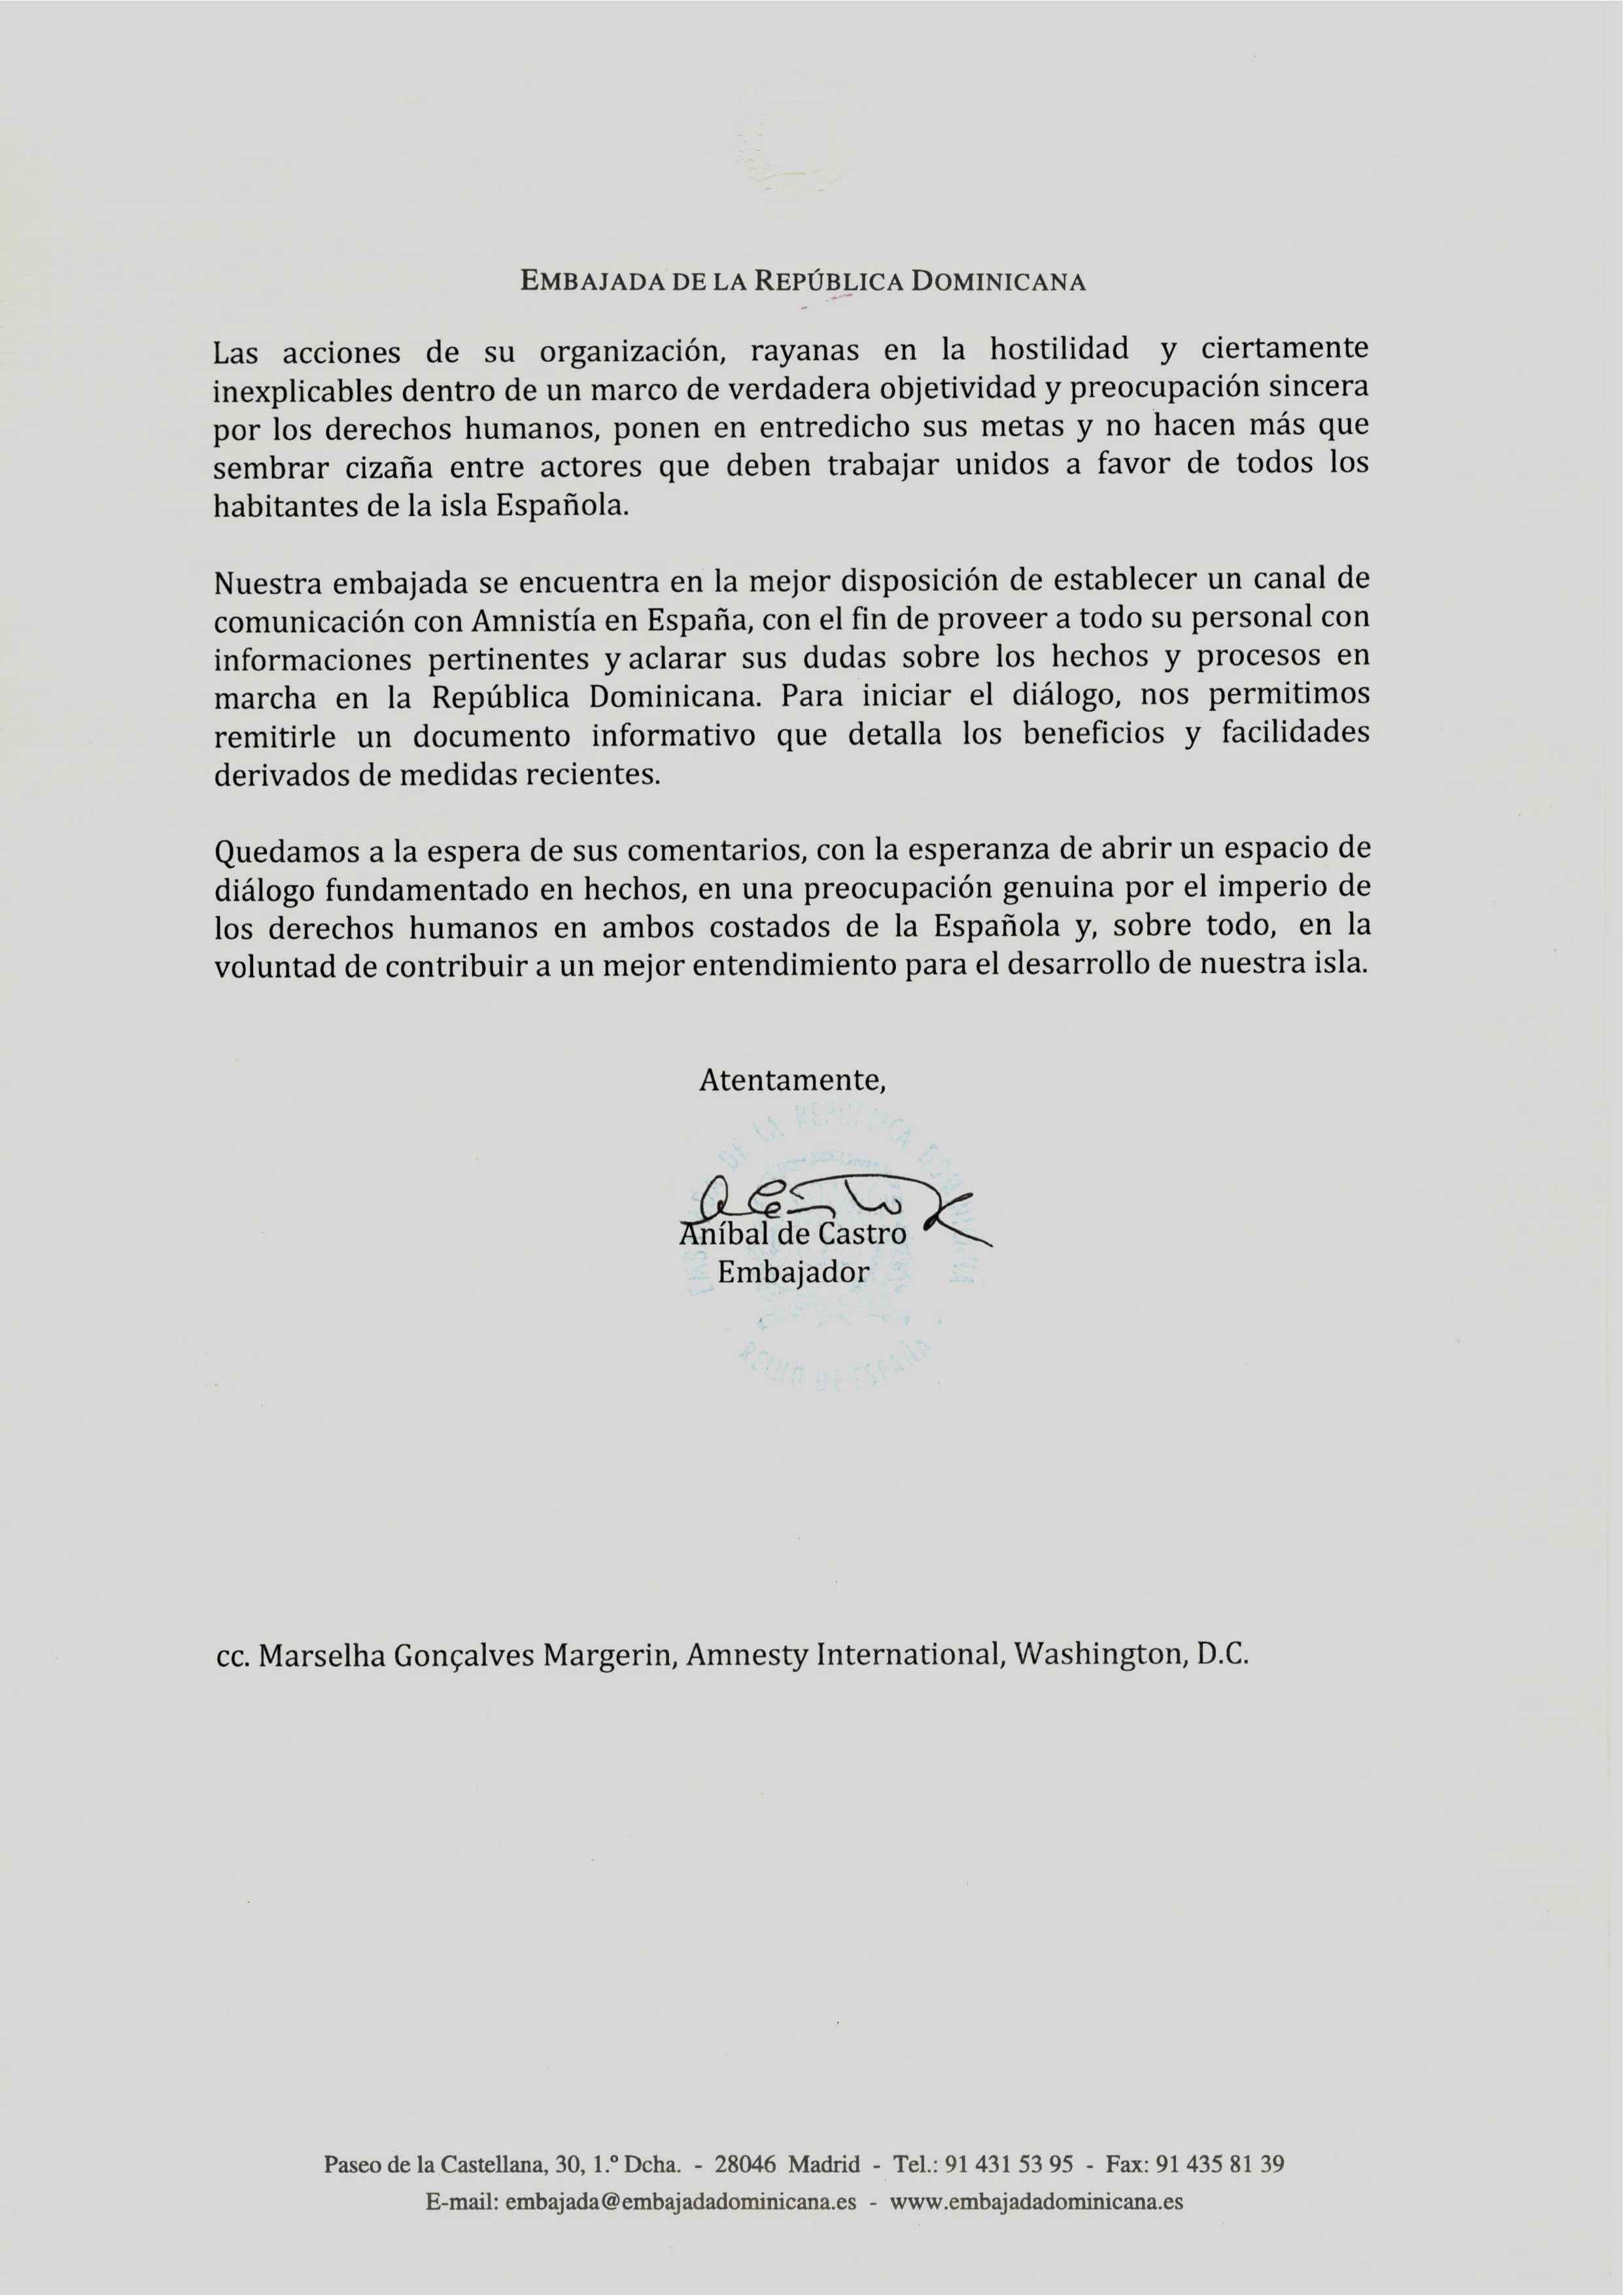 Carta-Anibal-de-Casto-Amnistia-ES-02